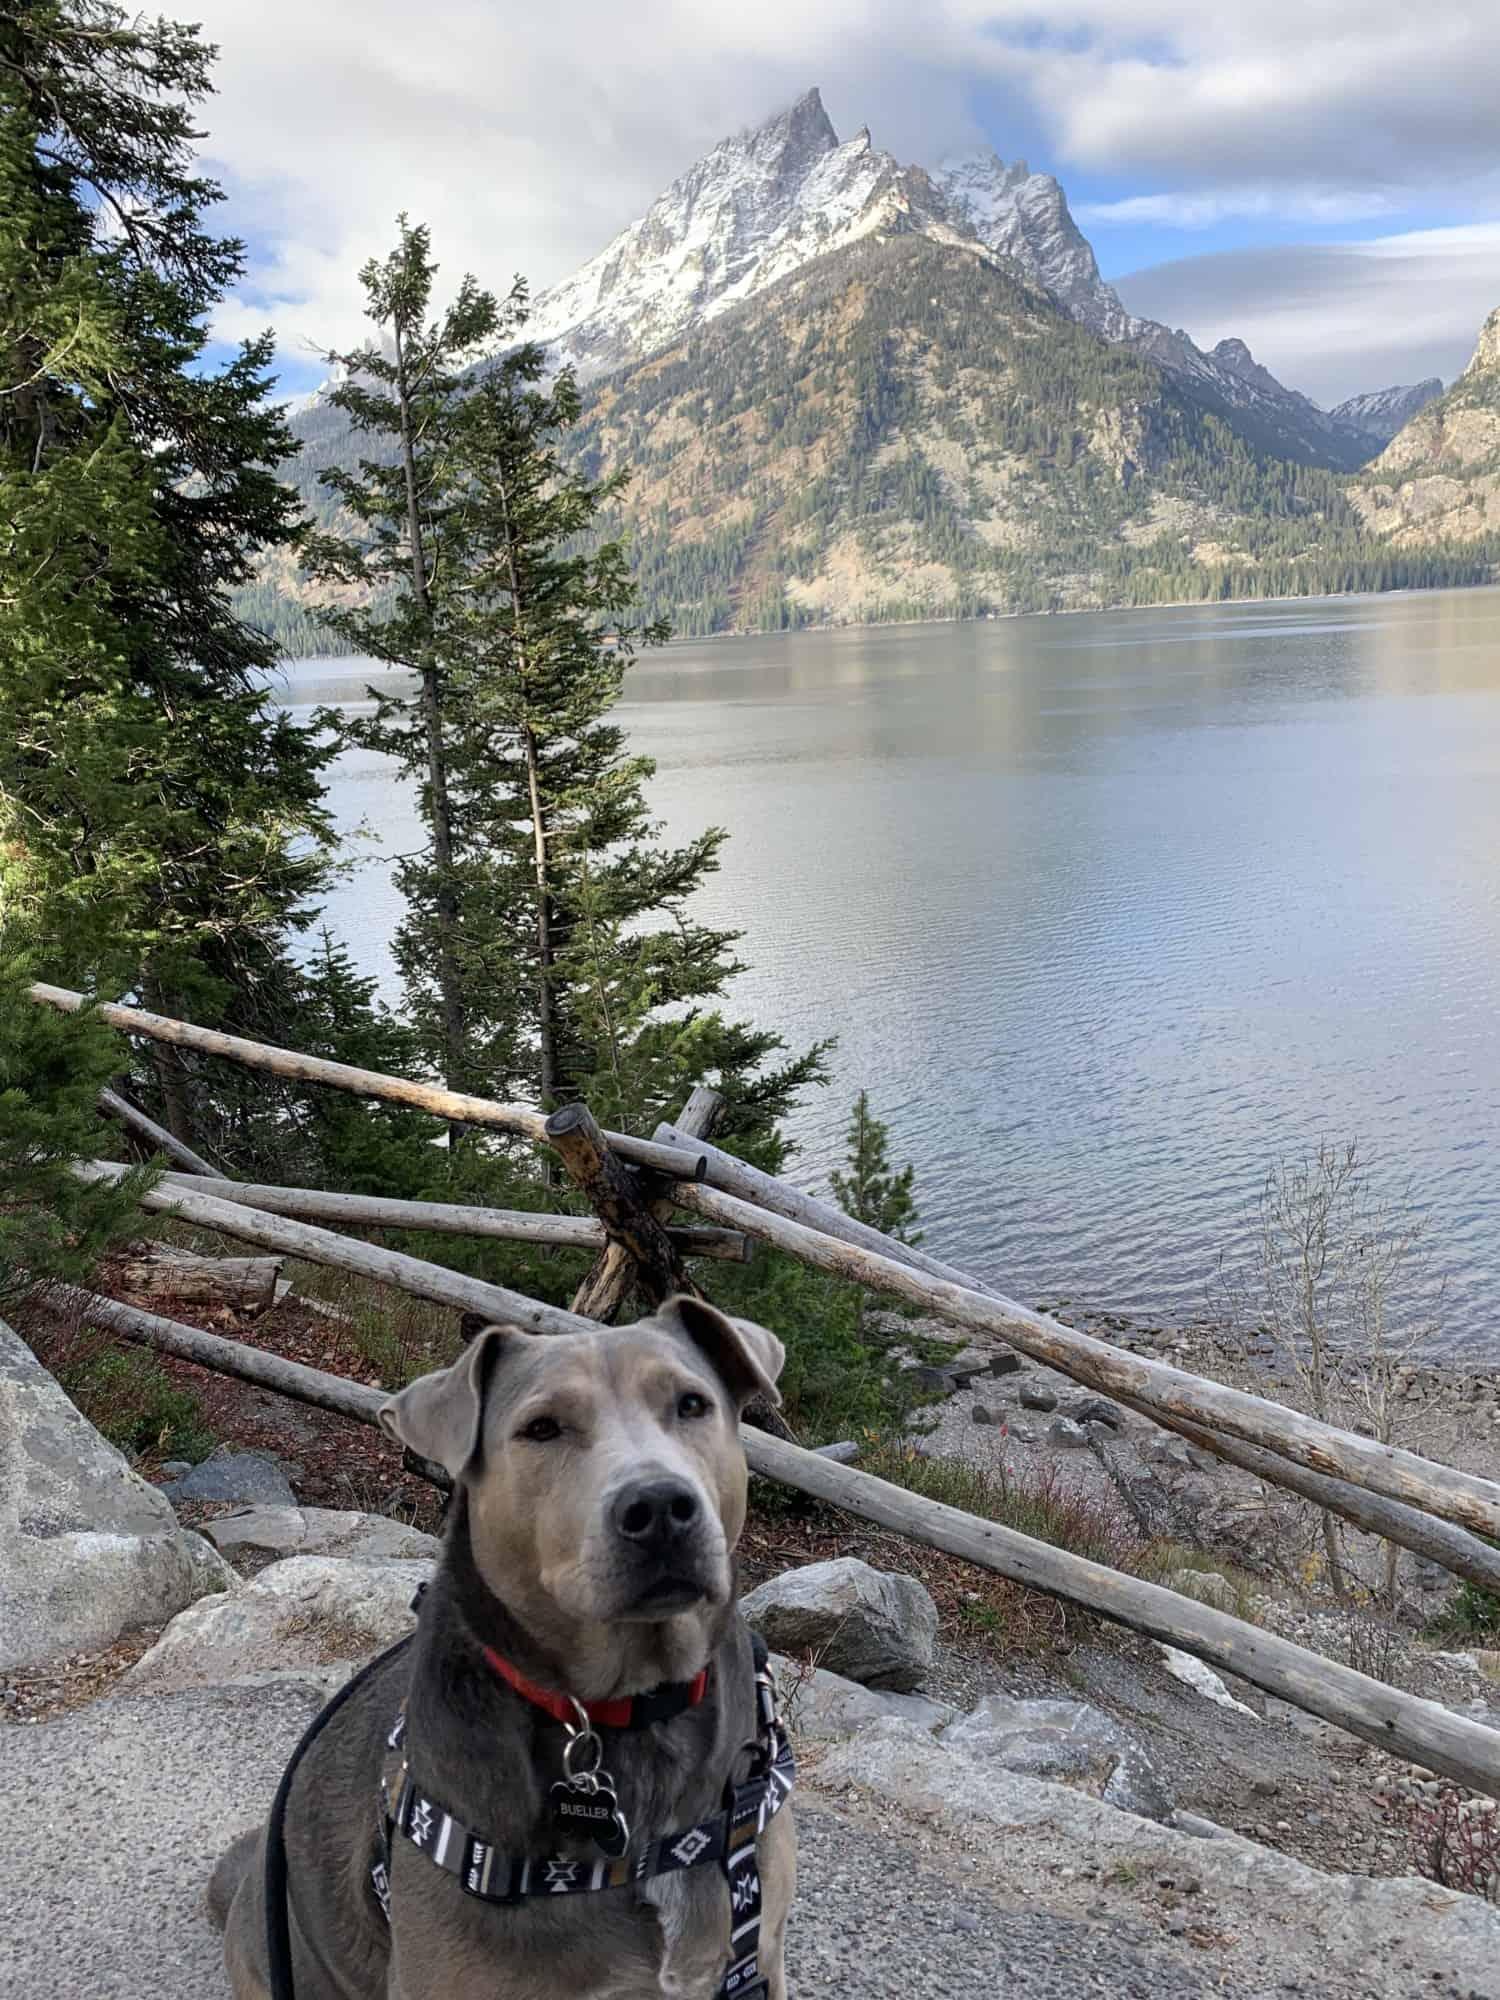 Dog sitting on a path next to a mountain lake